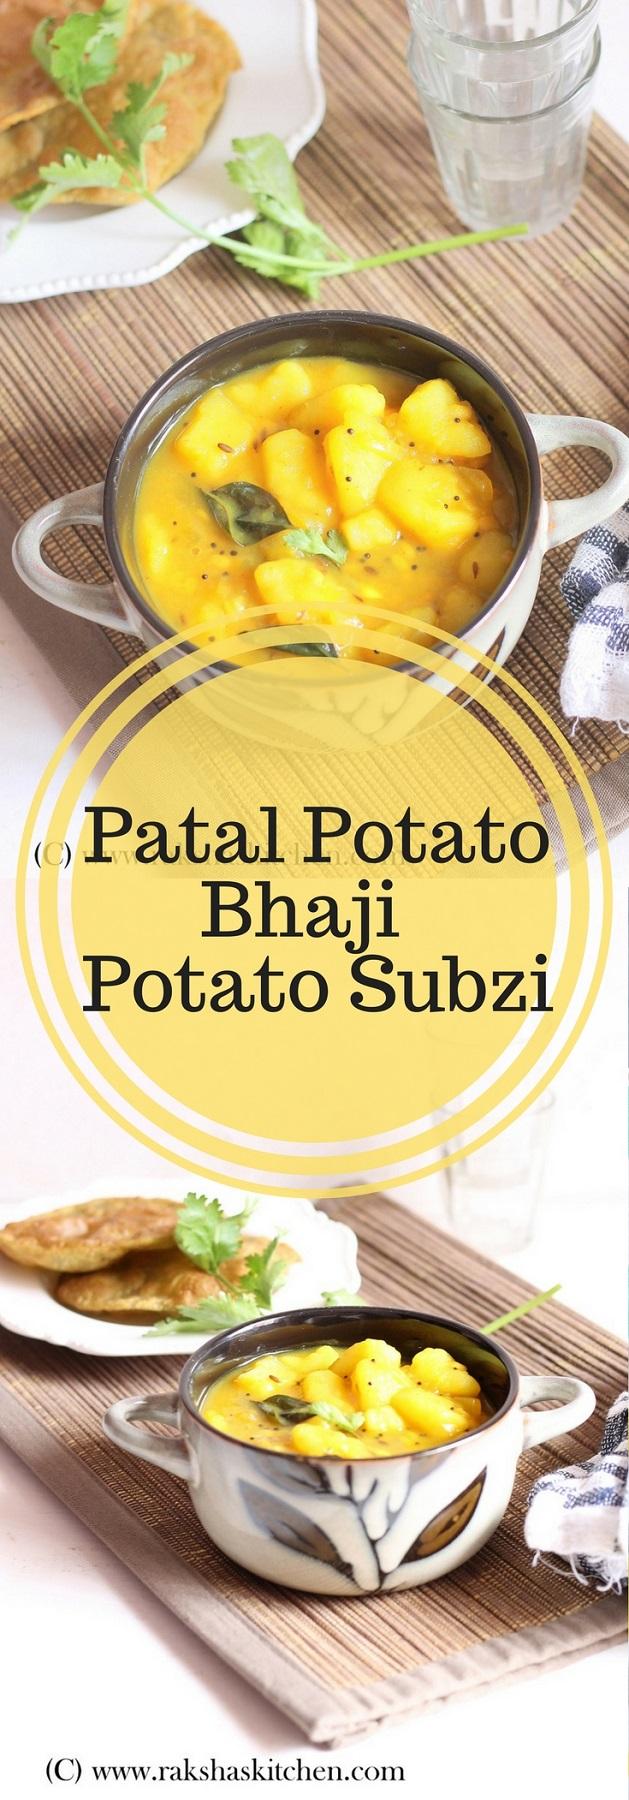 Potato bhaji, Potato subzi, Patal potato bhaji, Bataat bhaji, Batat bhaji